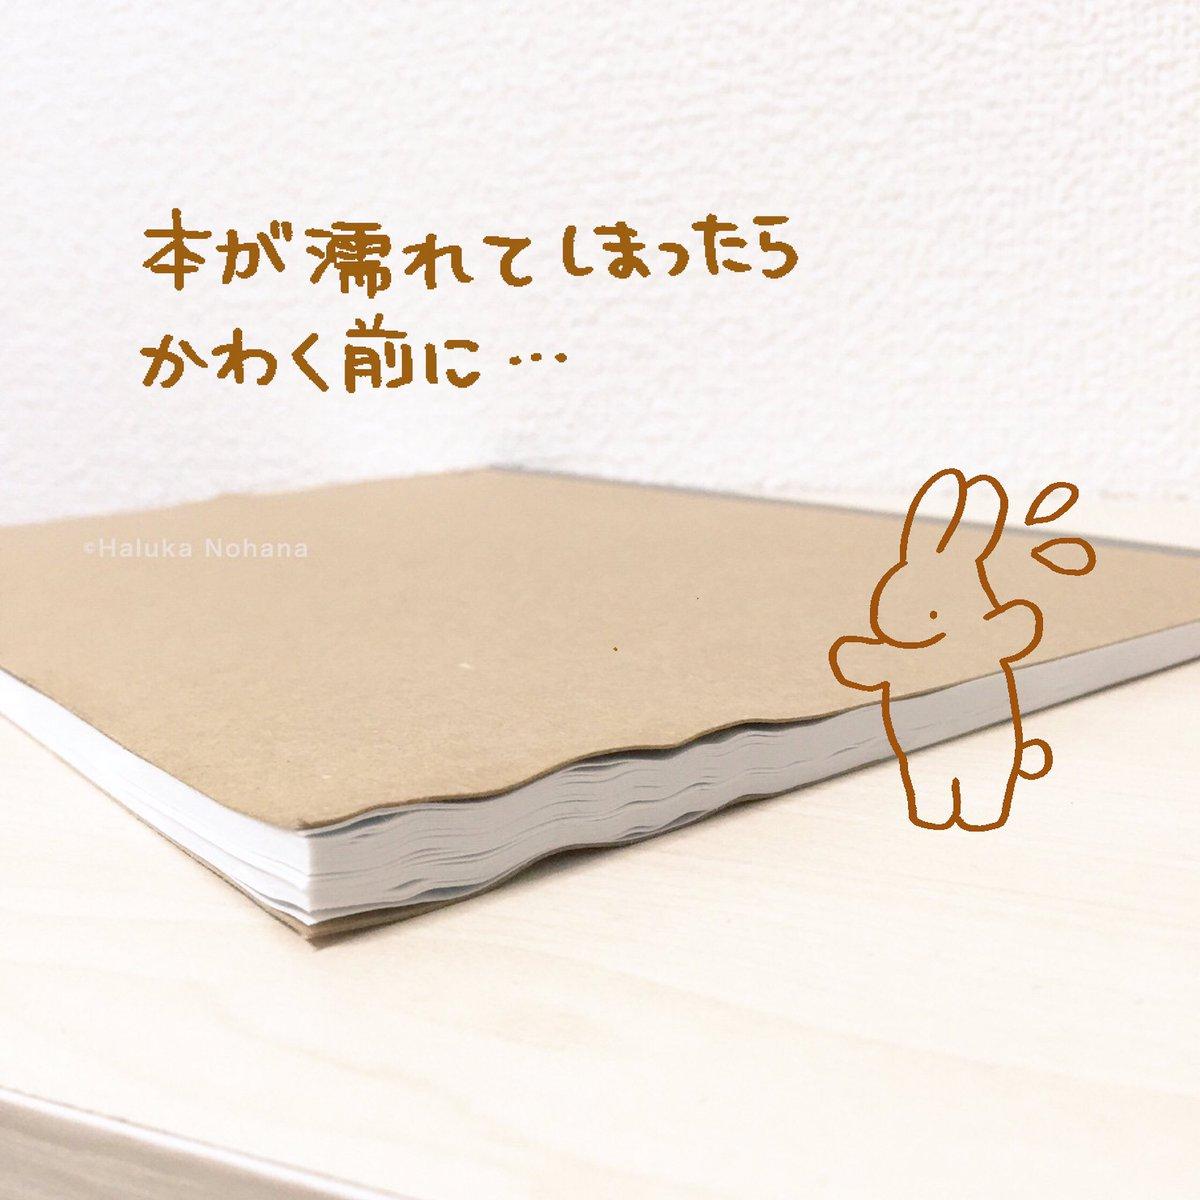 haruka-nohana-diy-fix-wet-book-pages-4